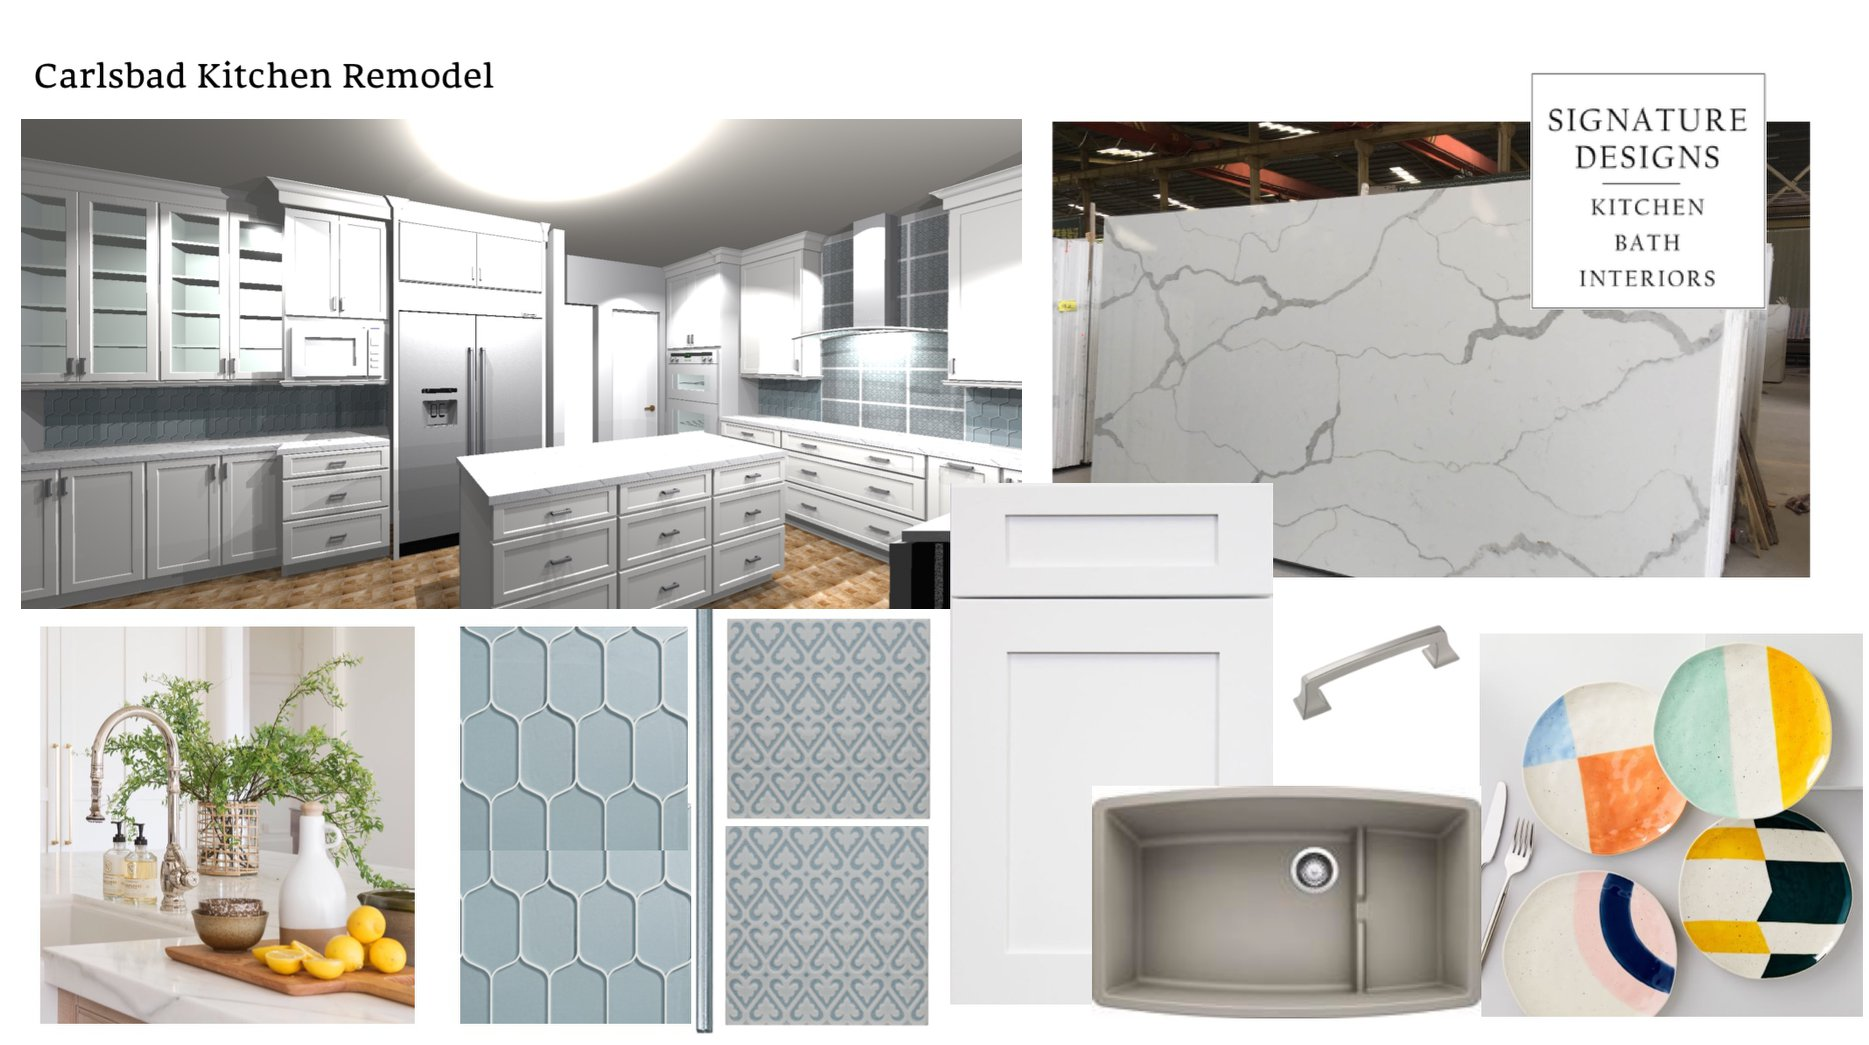 Budget Kitchen Remodel.jpg